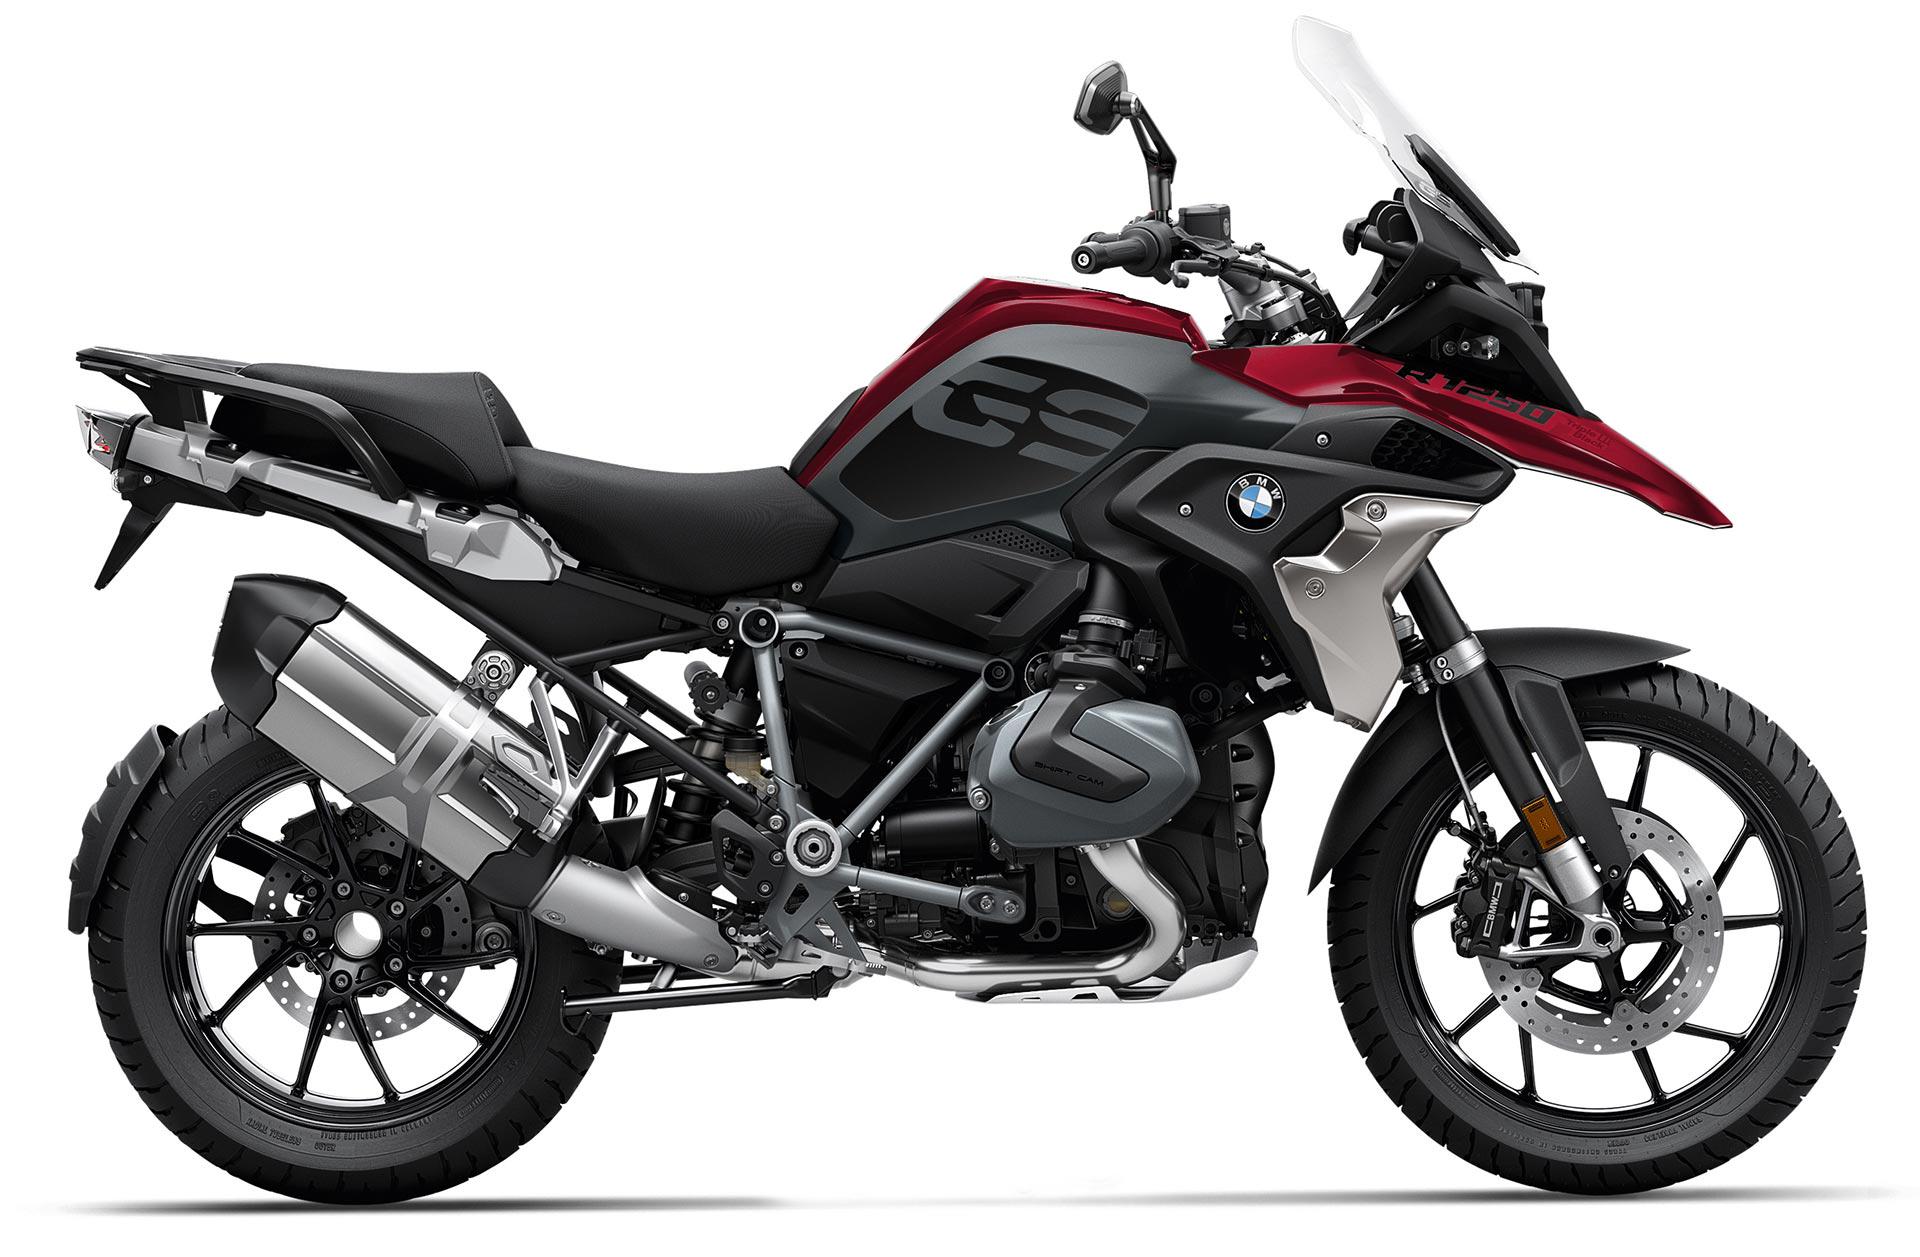 2021-BMW-R1250GS-TripleBlack-Rot.png